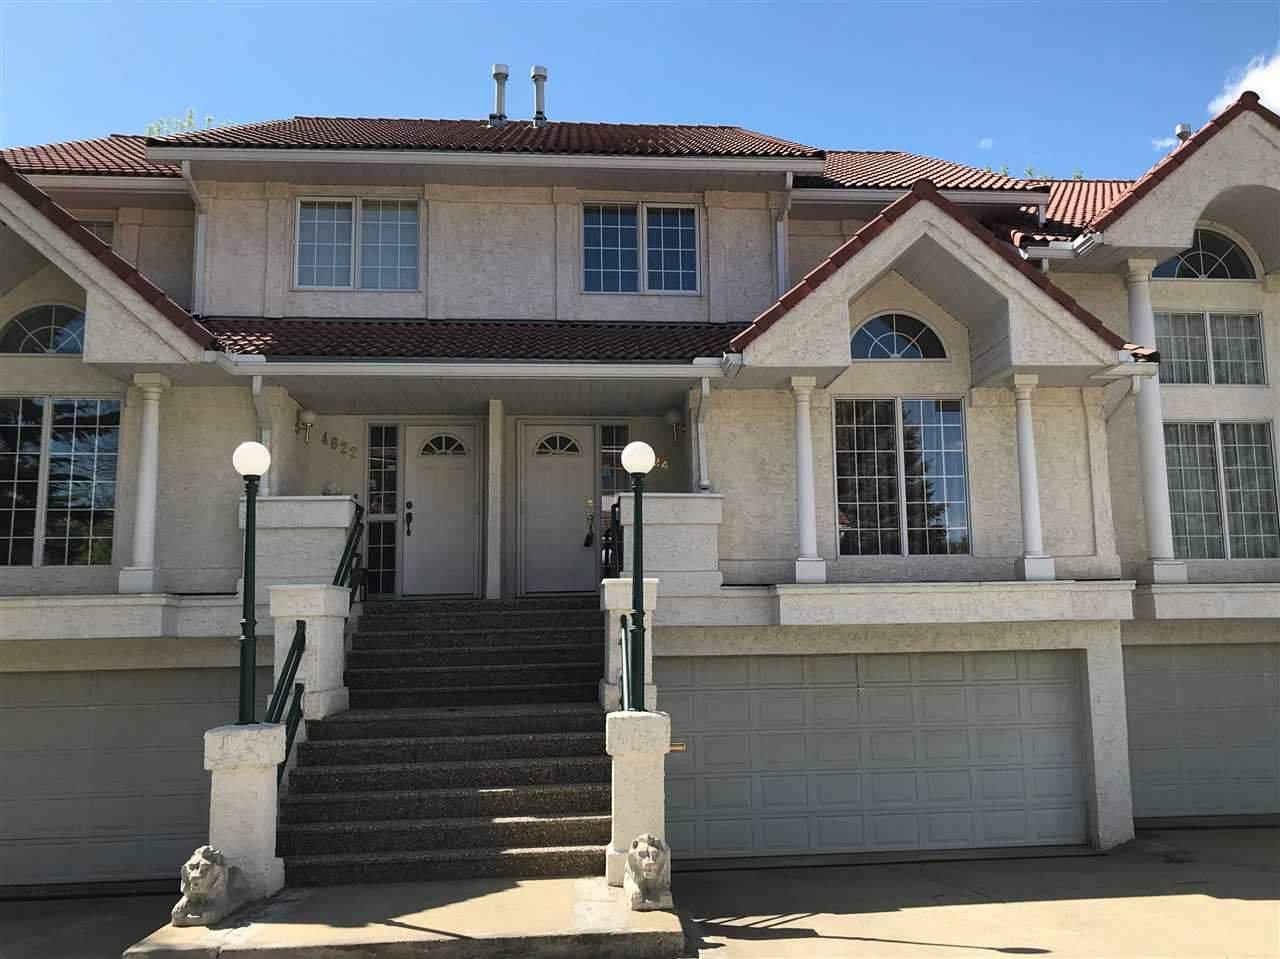 Main Photo: 4624 151 Street in Edmonton: Zone 14 Townhouse for sale : MLS®# E4211665